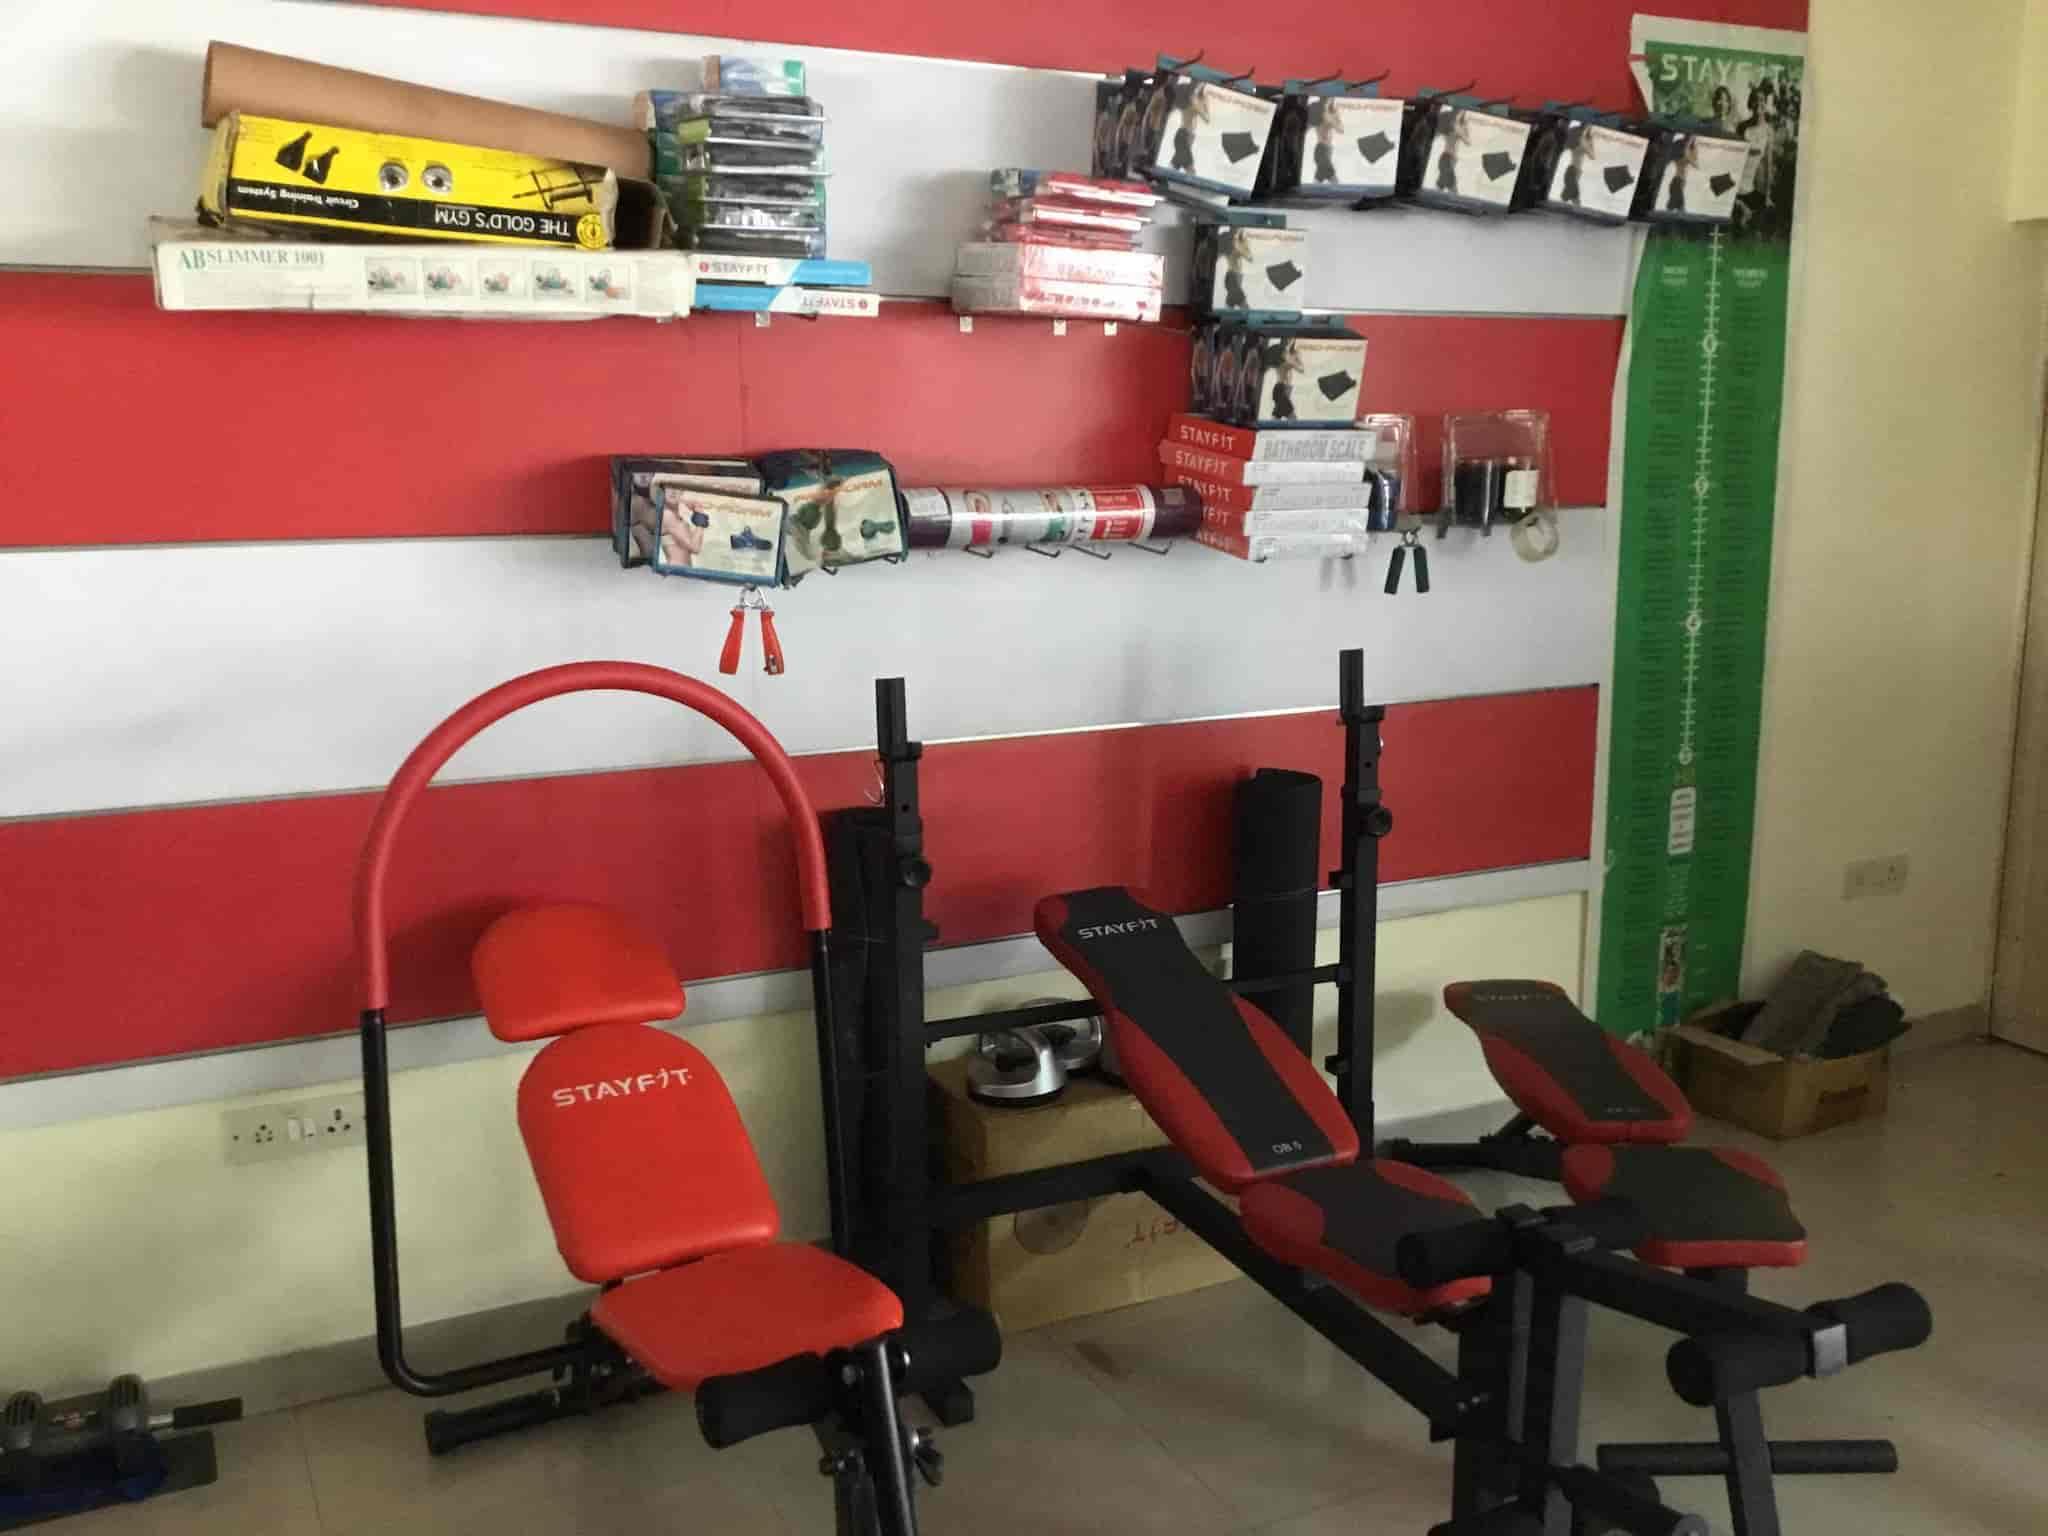 Stayfit Mahalakshmipuram Layout Treadmill Repair Services In Short Circuit Bangalore Justdial